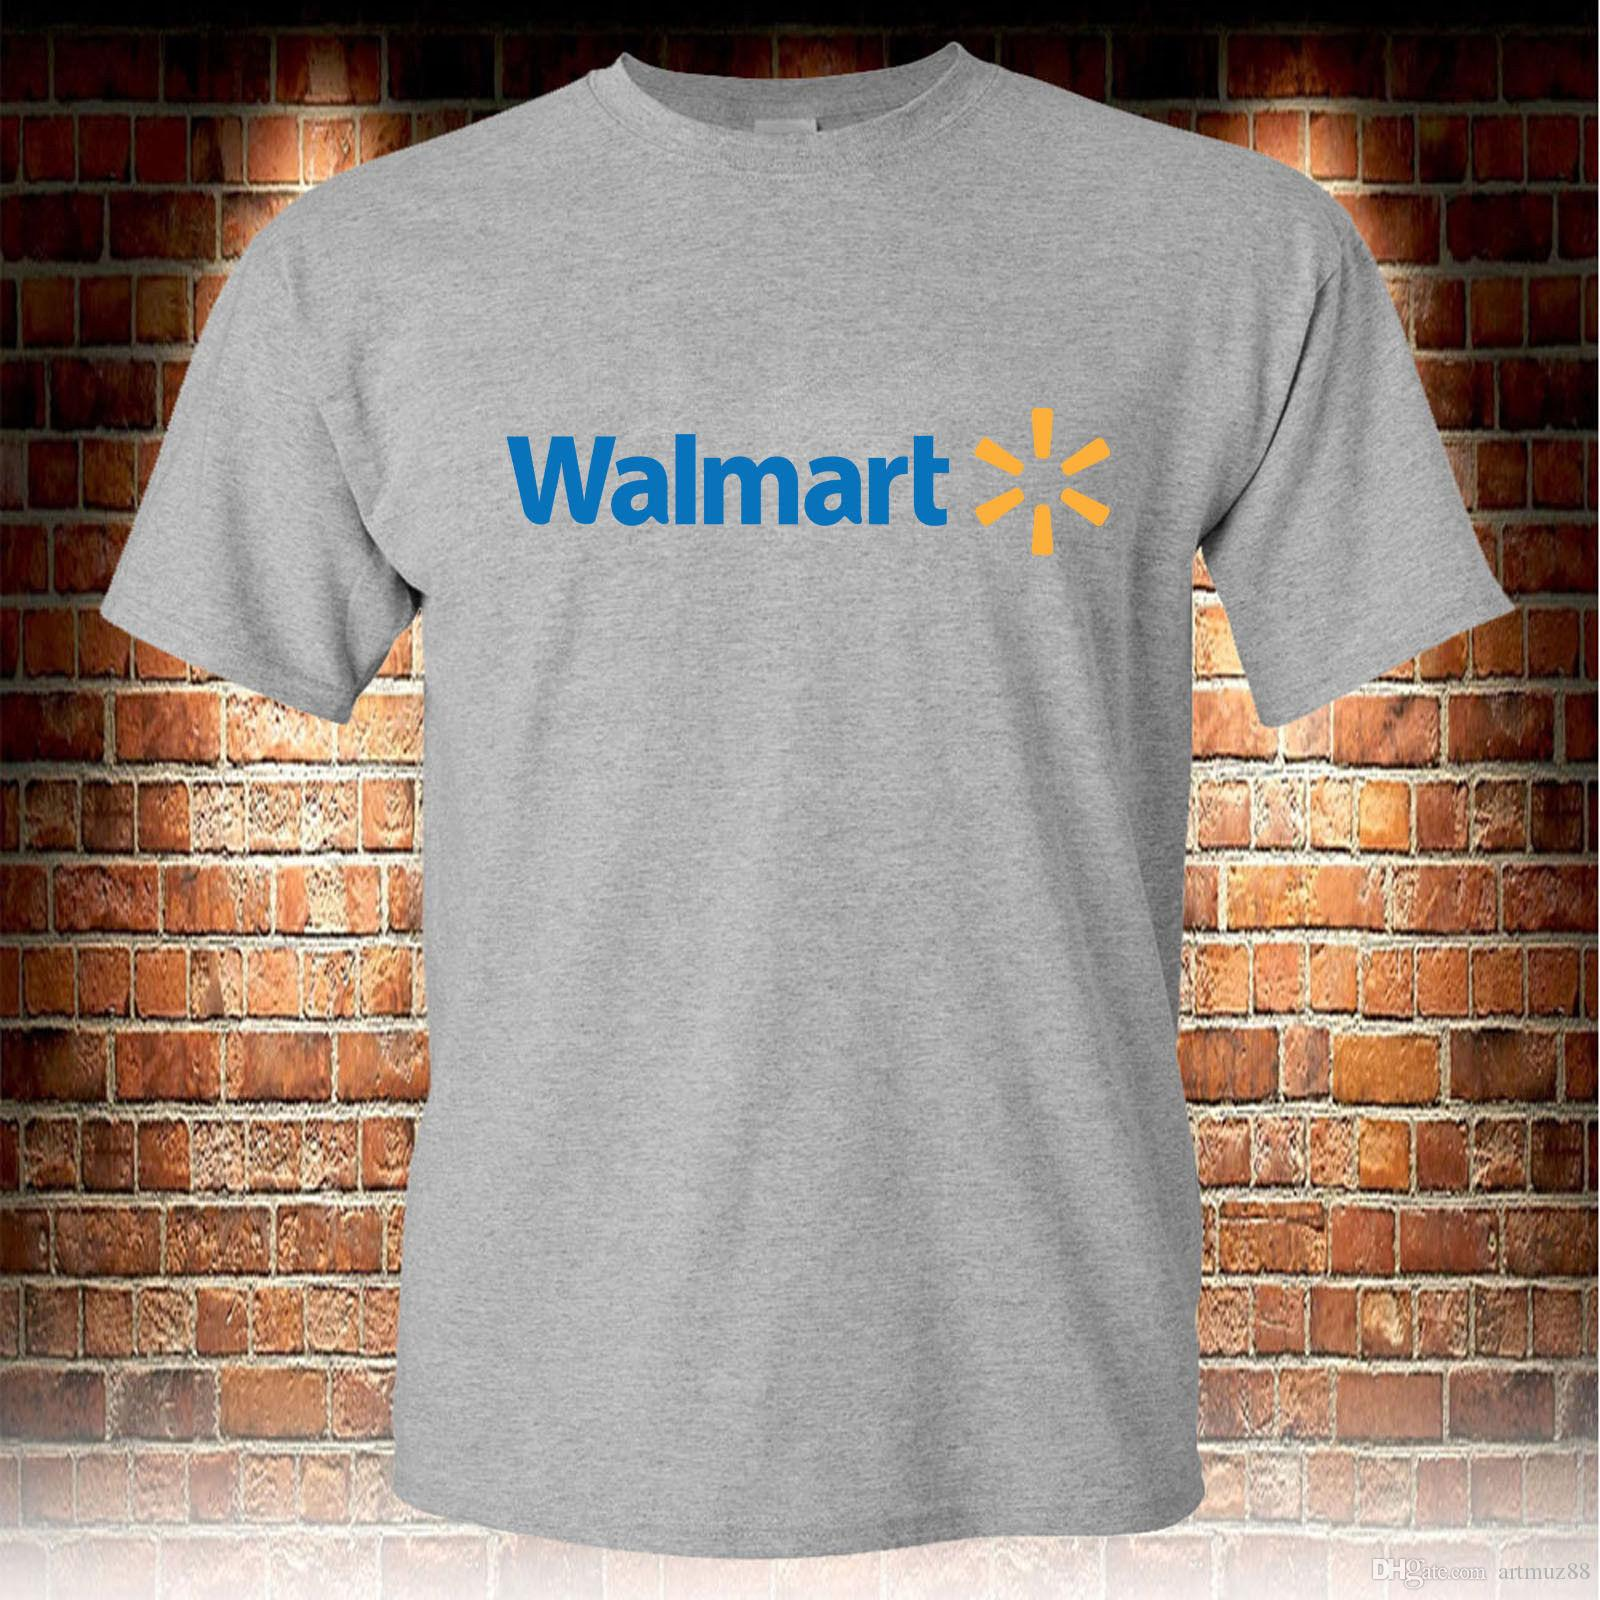 9b595f3e Walmart Market Store Grey T Shirt Men'S Tshirt S To 3XL Funny T ...